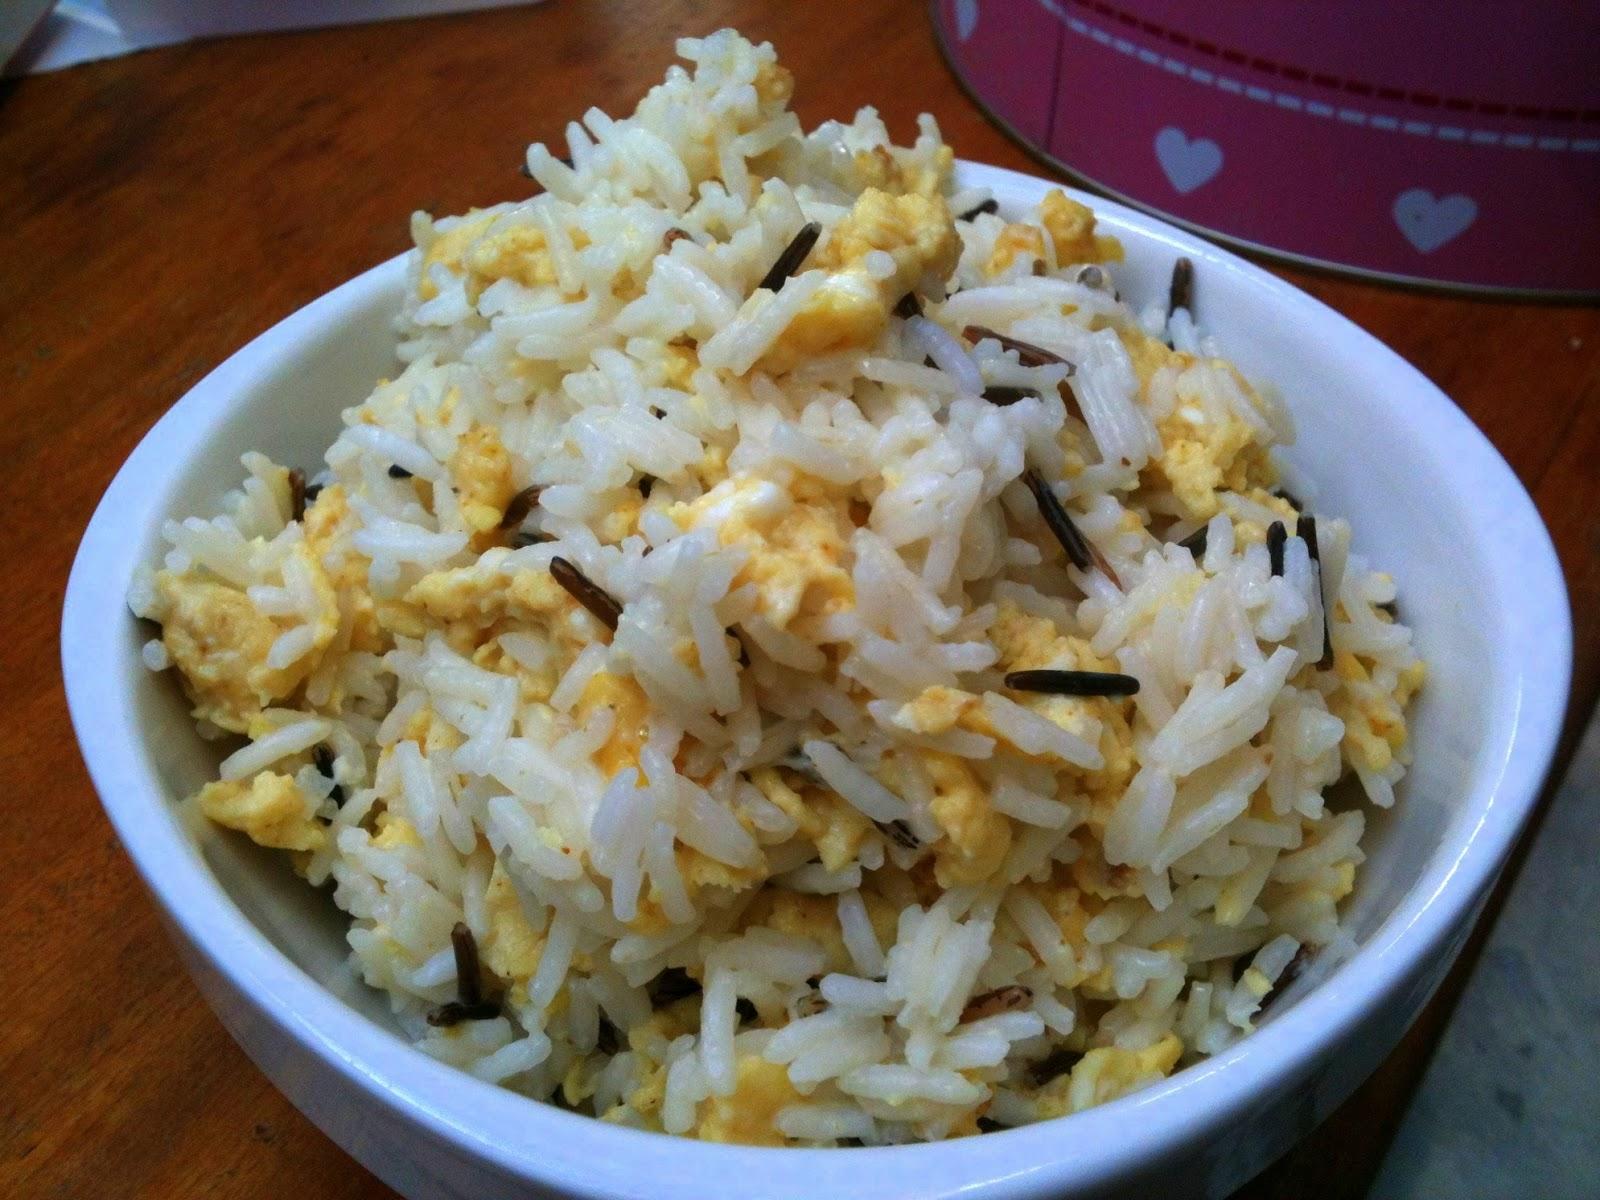 la cuisine de marine riz aux oeufs brouill s au curry. Black Bedroom Furniture Sets. Home Design Ideas